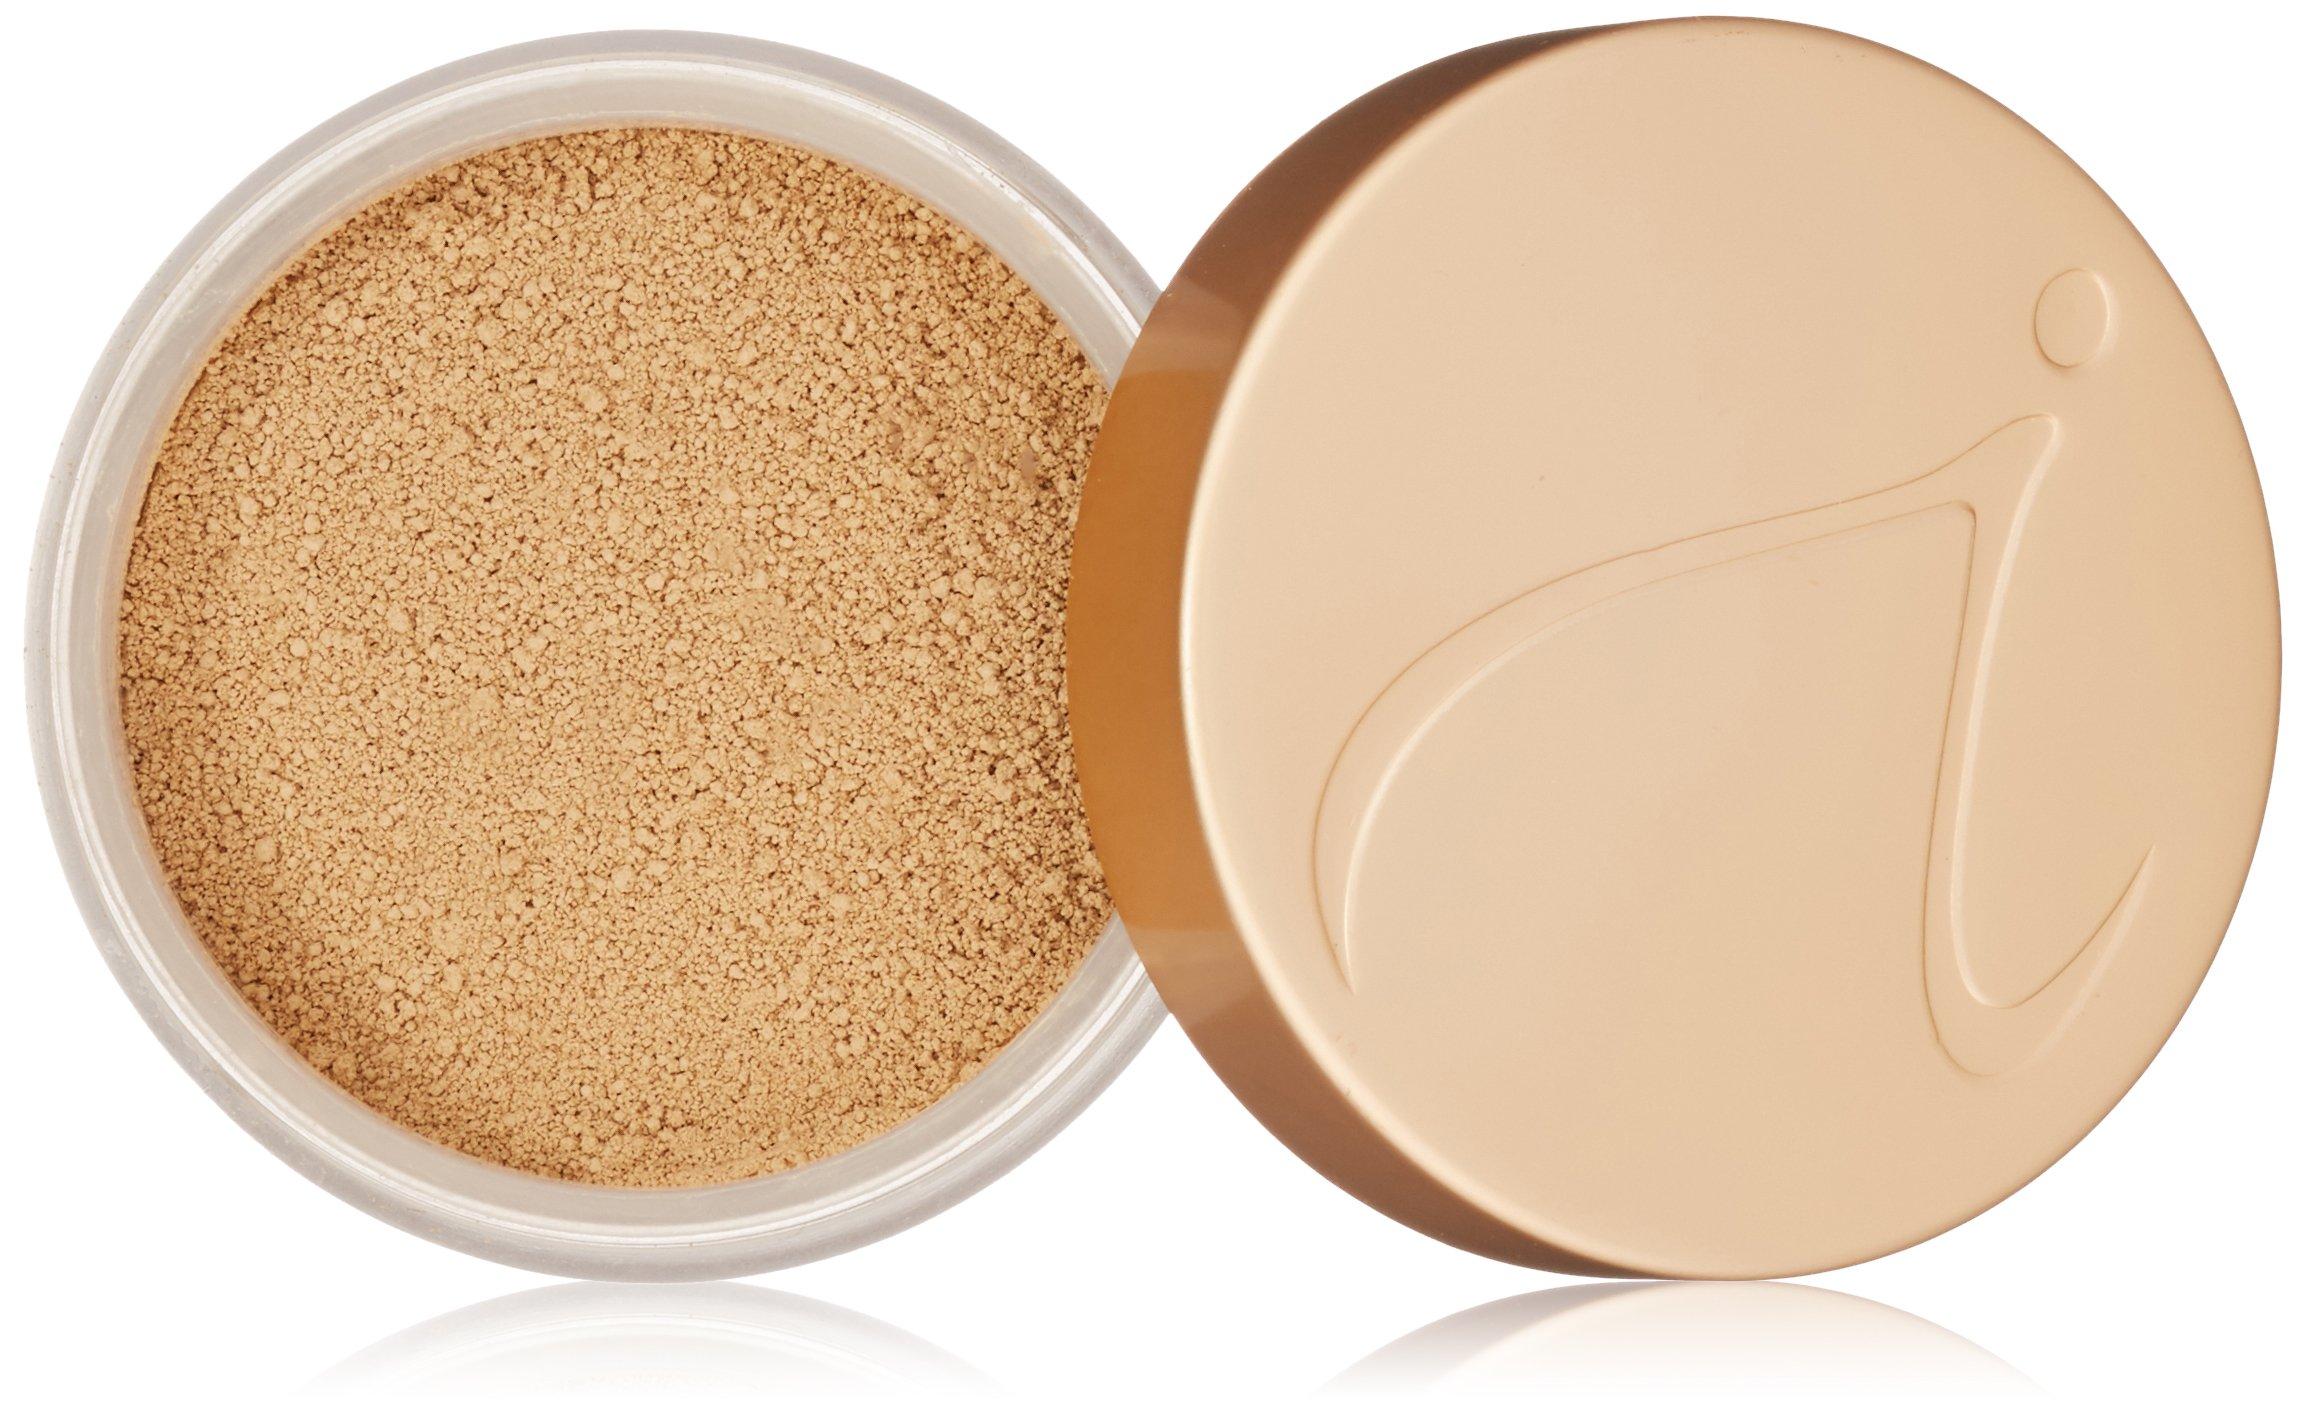 jane iredale Amazing Base Loose Mineral Powder, Golden Glow, 0.37 oz.